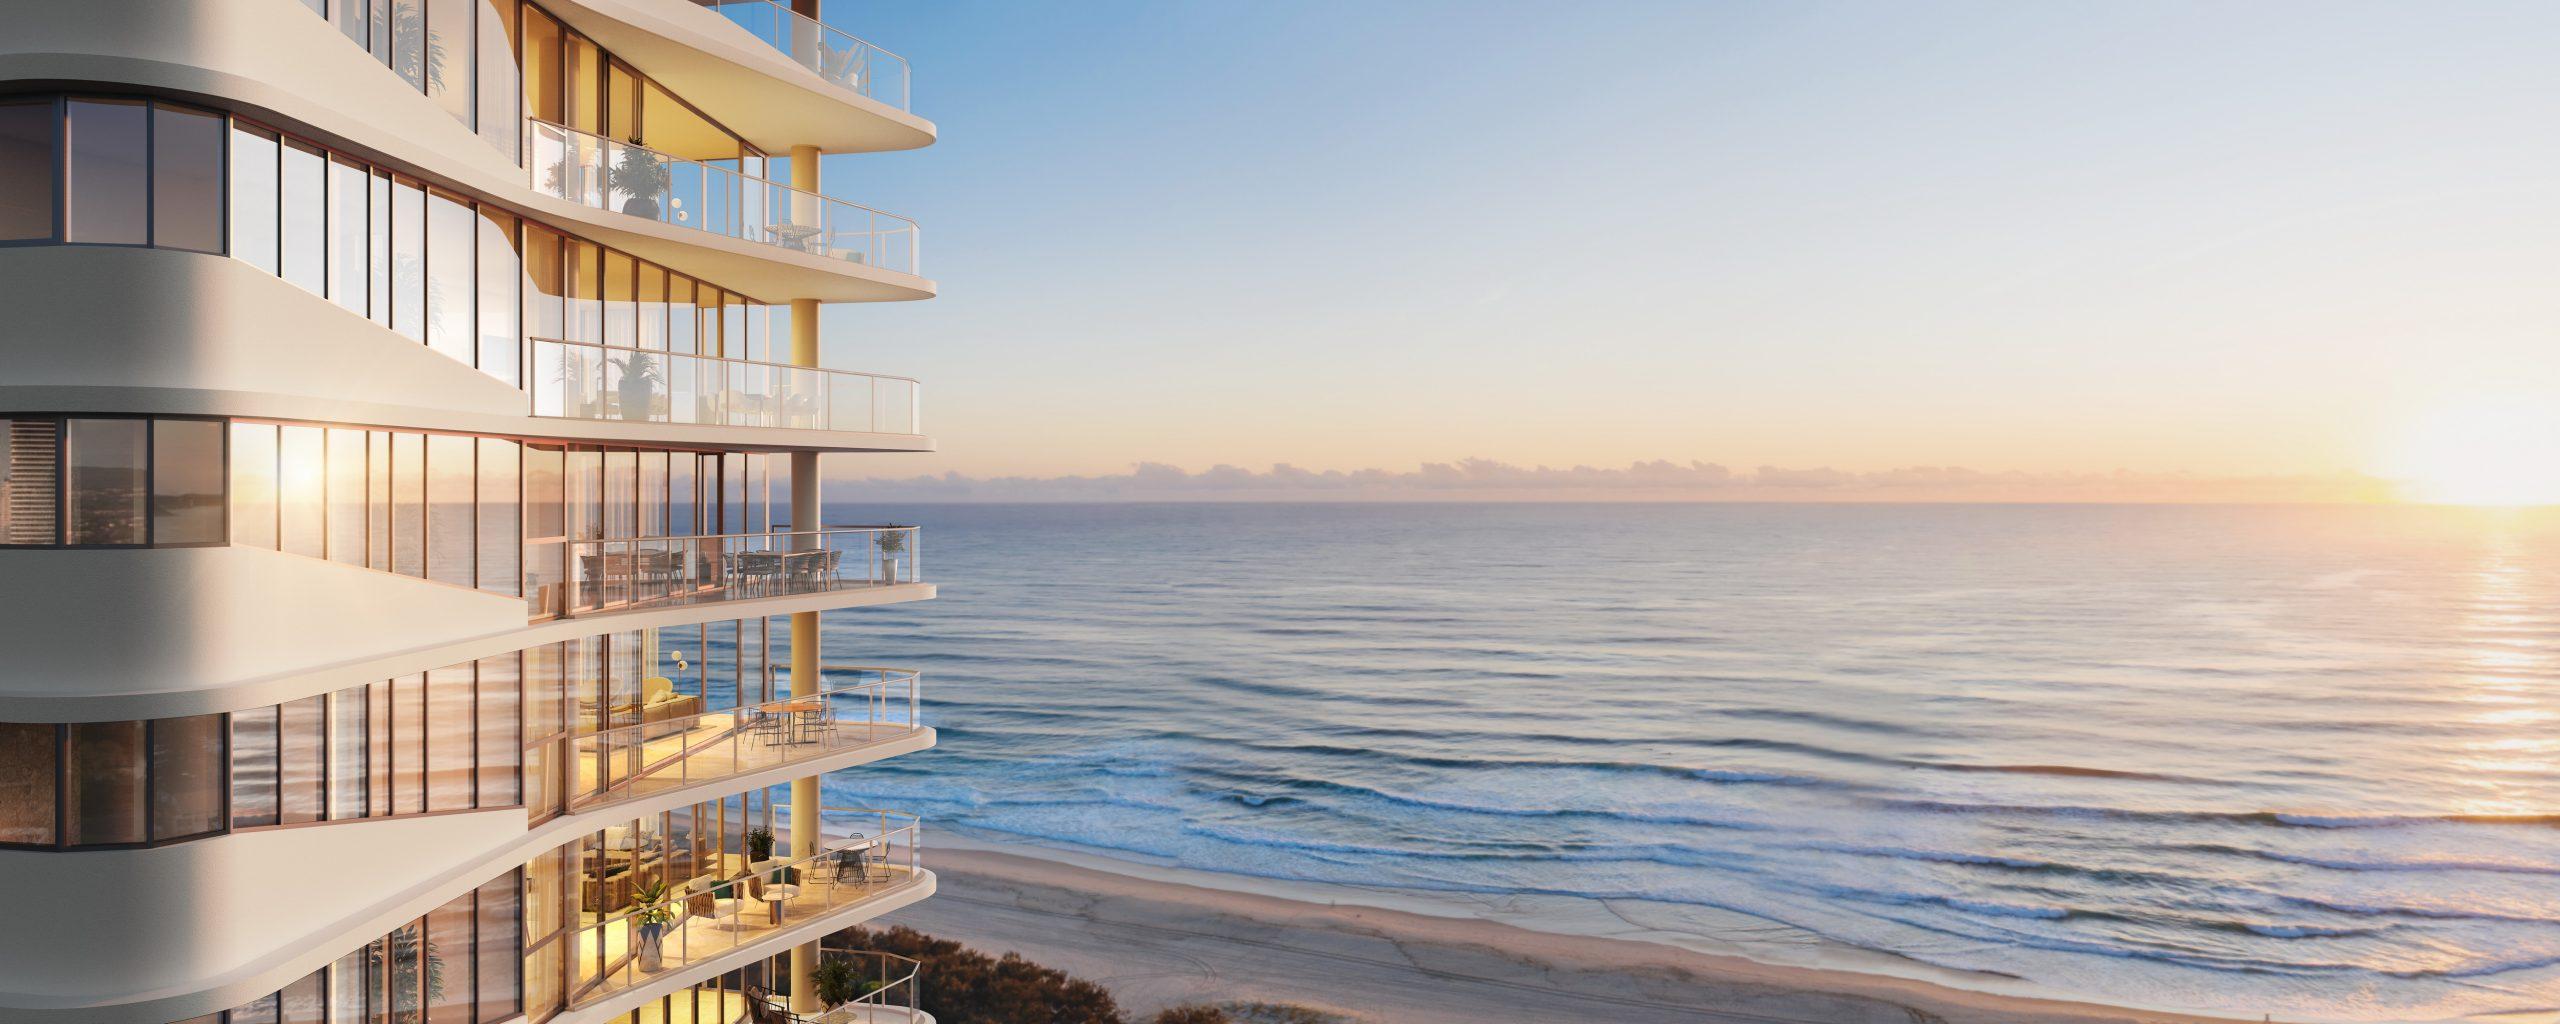 Fkd-studio-dawn-mermaid-beach-mosaic-property-render-3d-amenity-exterior-superman-ocean-view